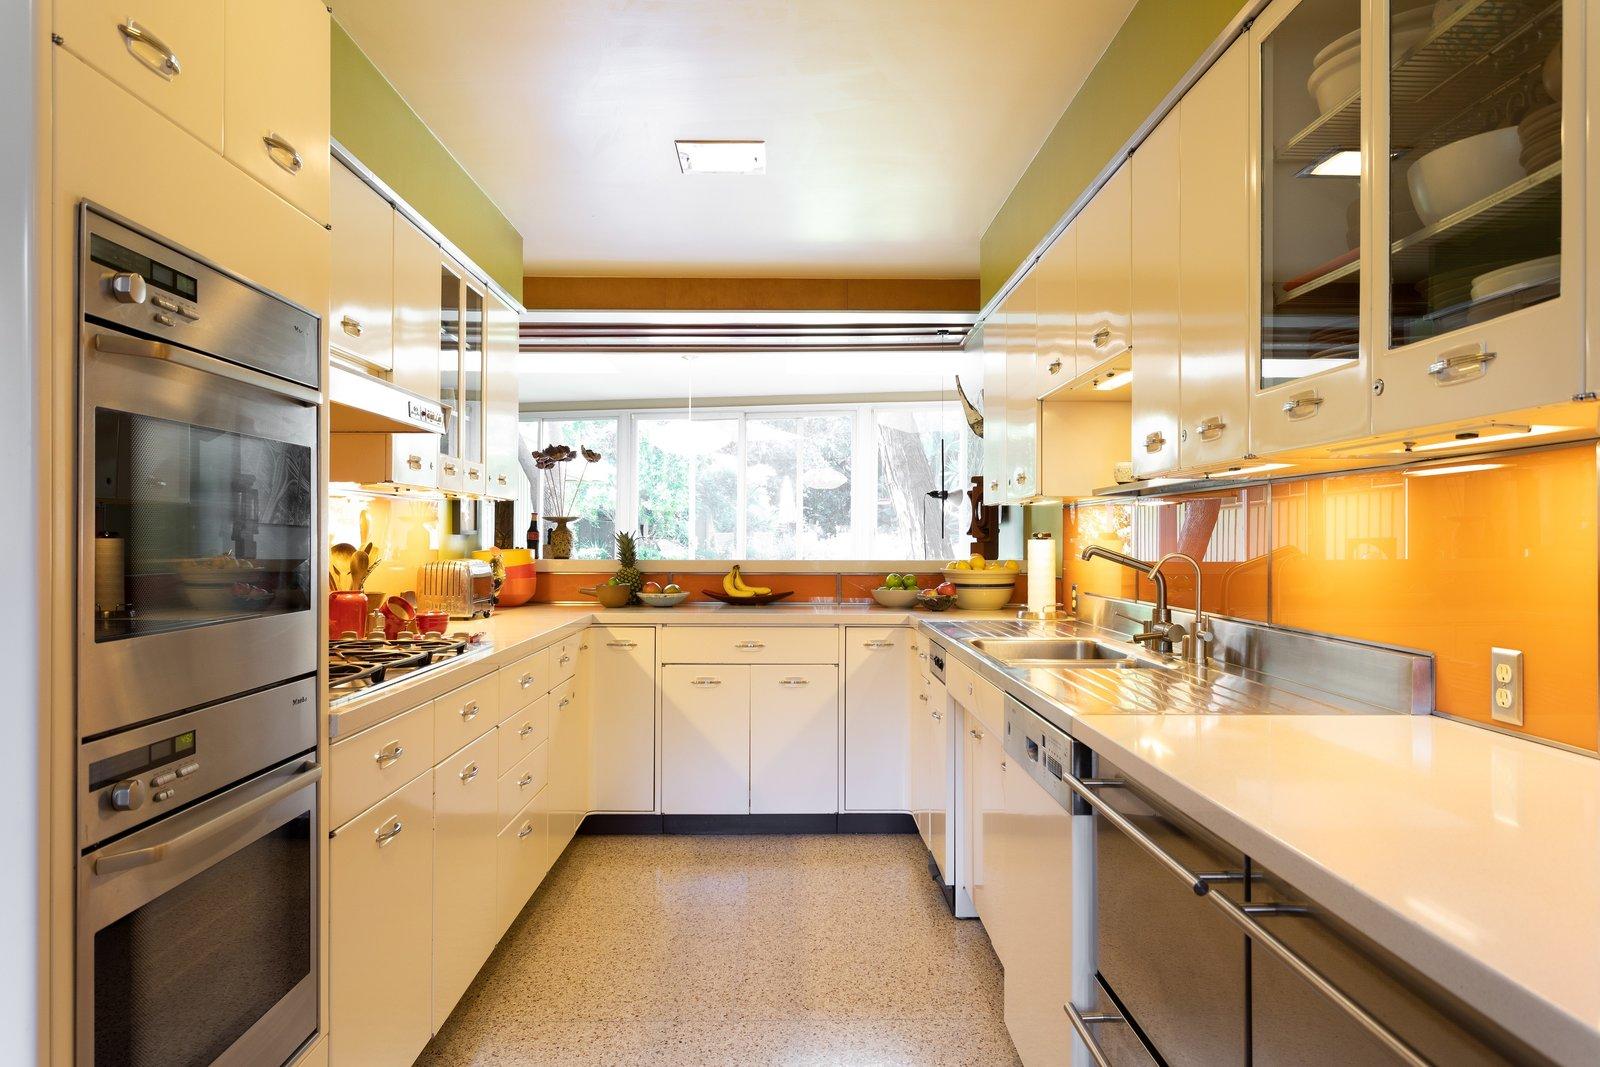 Richard Neutra Wilkins House Case Study House #13  kitchen